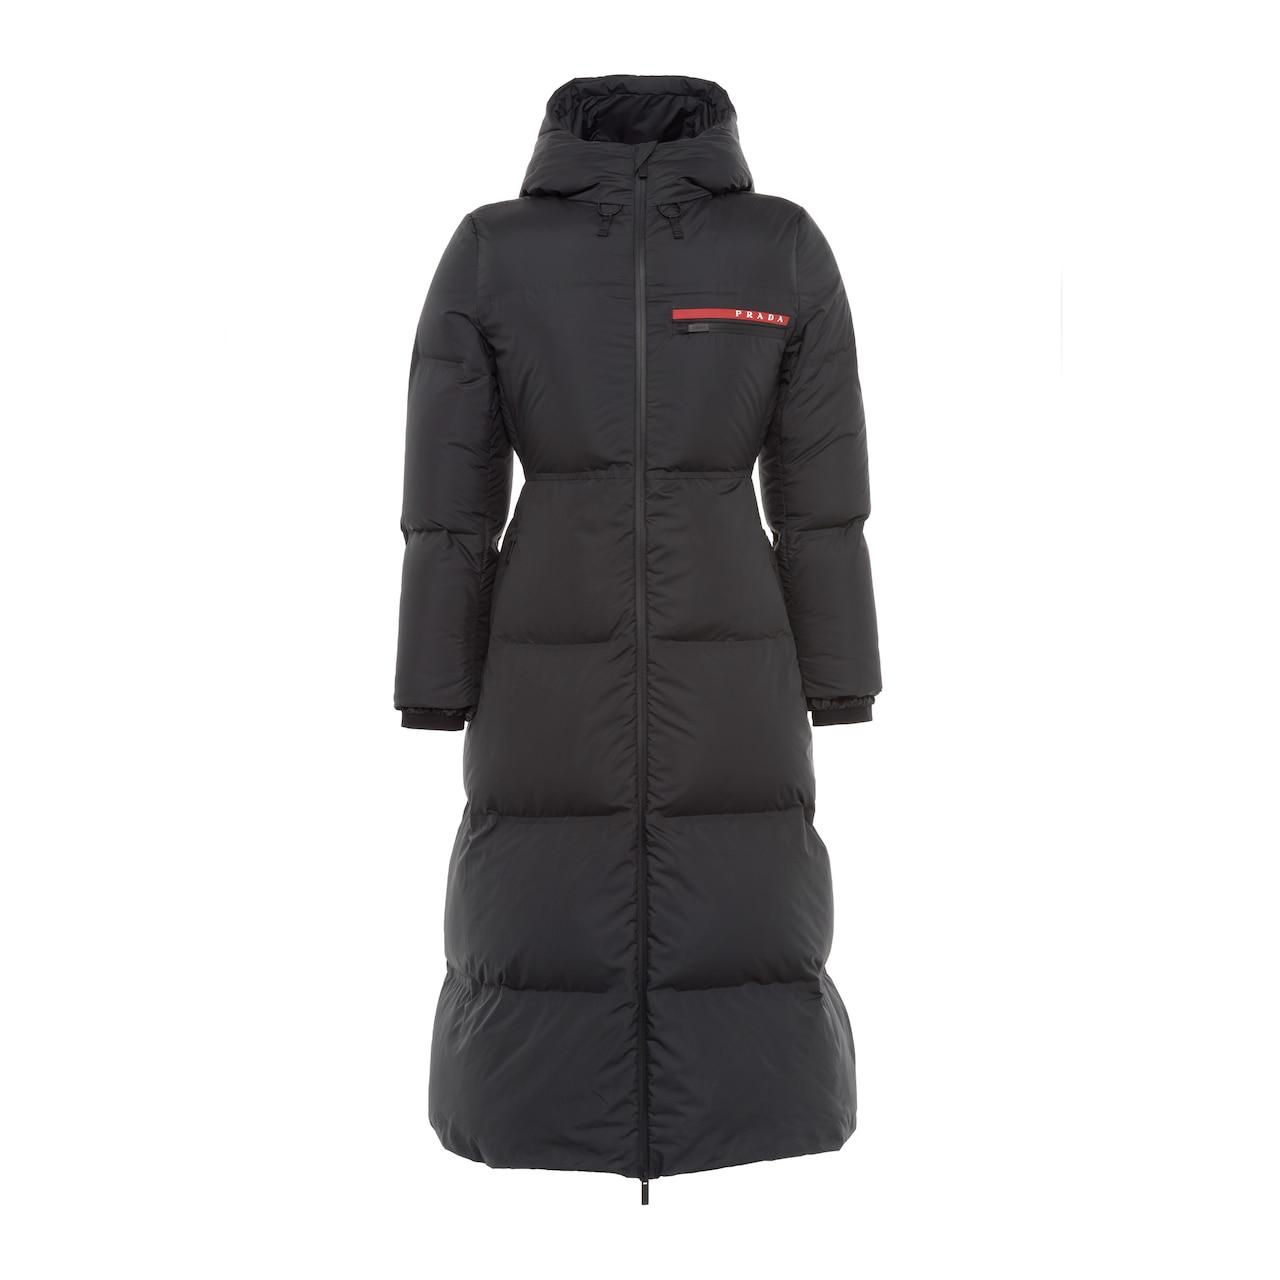 LR-HX022 technical nylon puffer coat